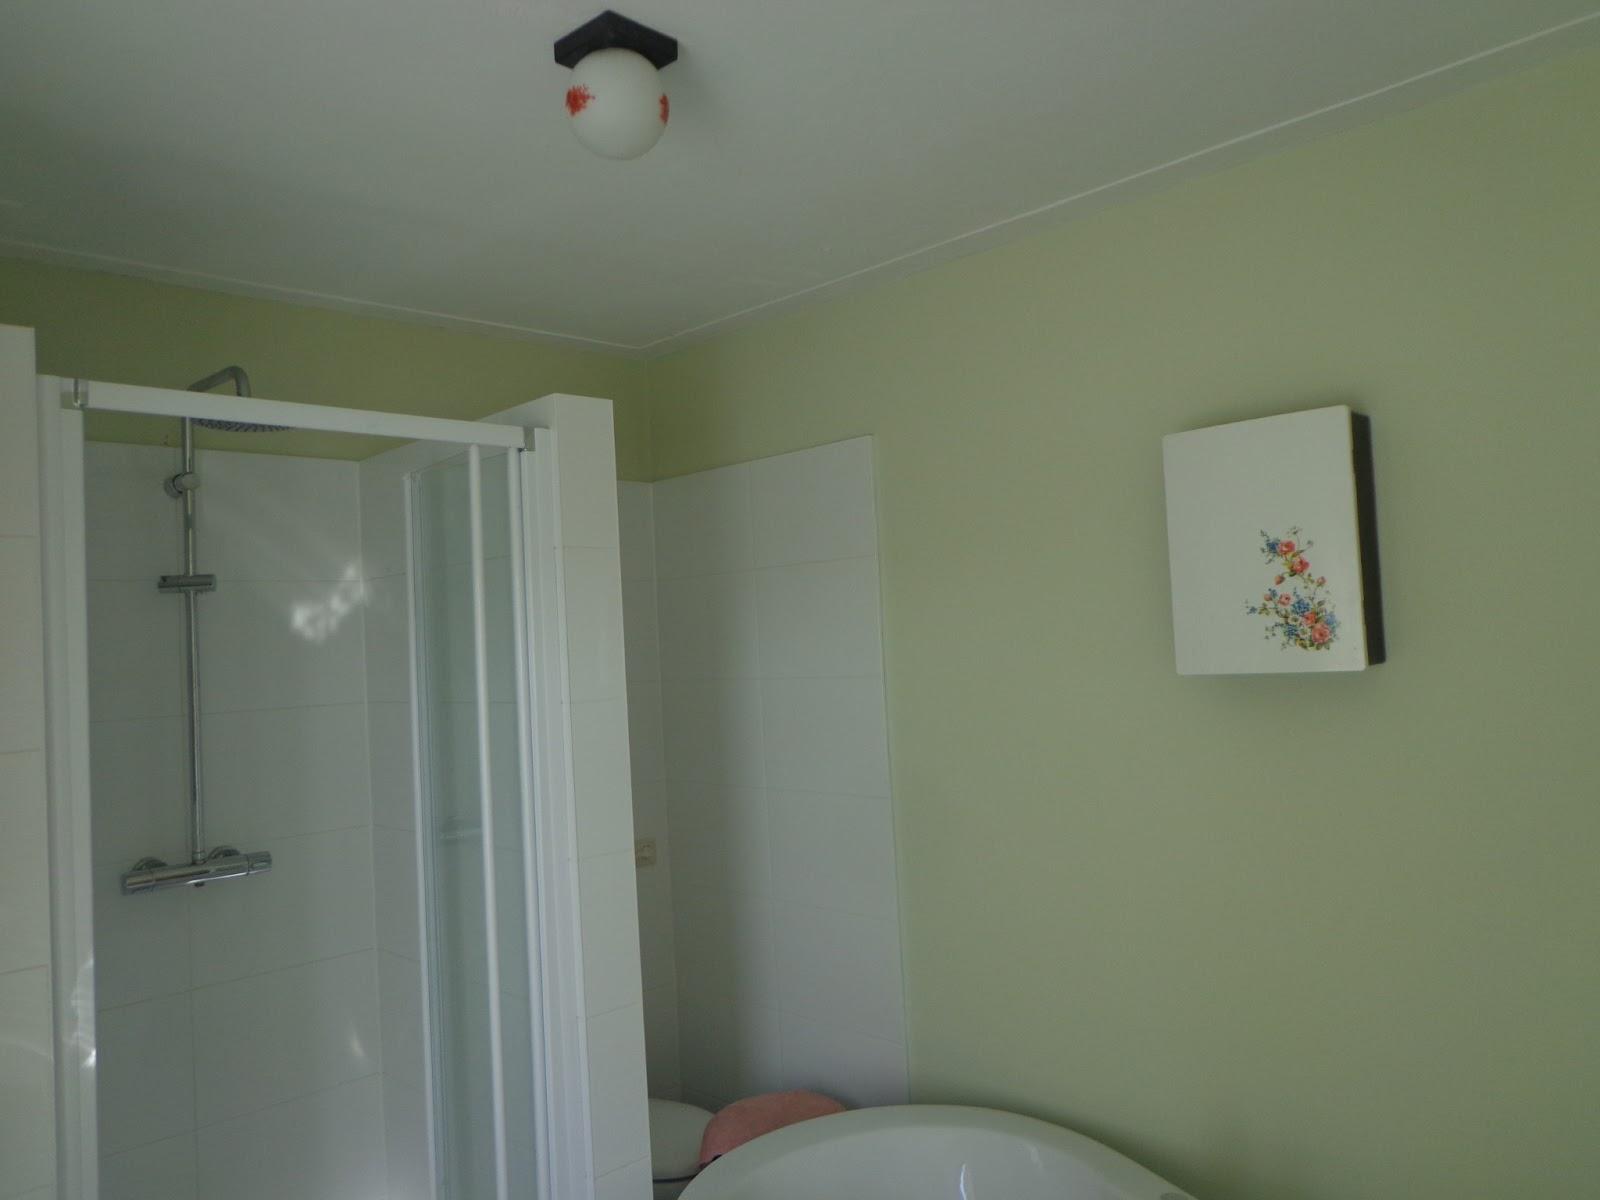 Muurverf Voor Badkamer : Badkamer van blauw naar groen retroloekie